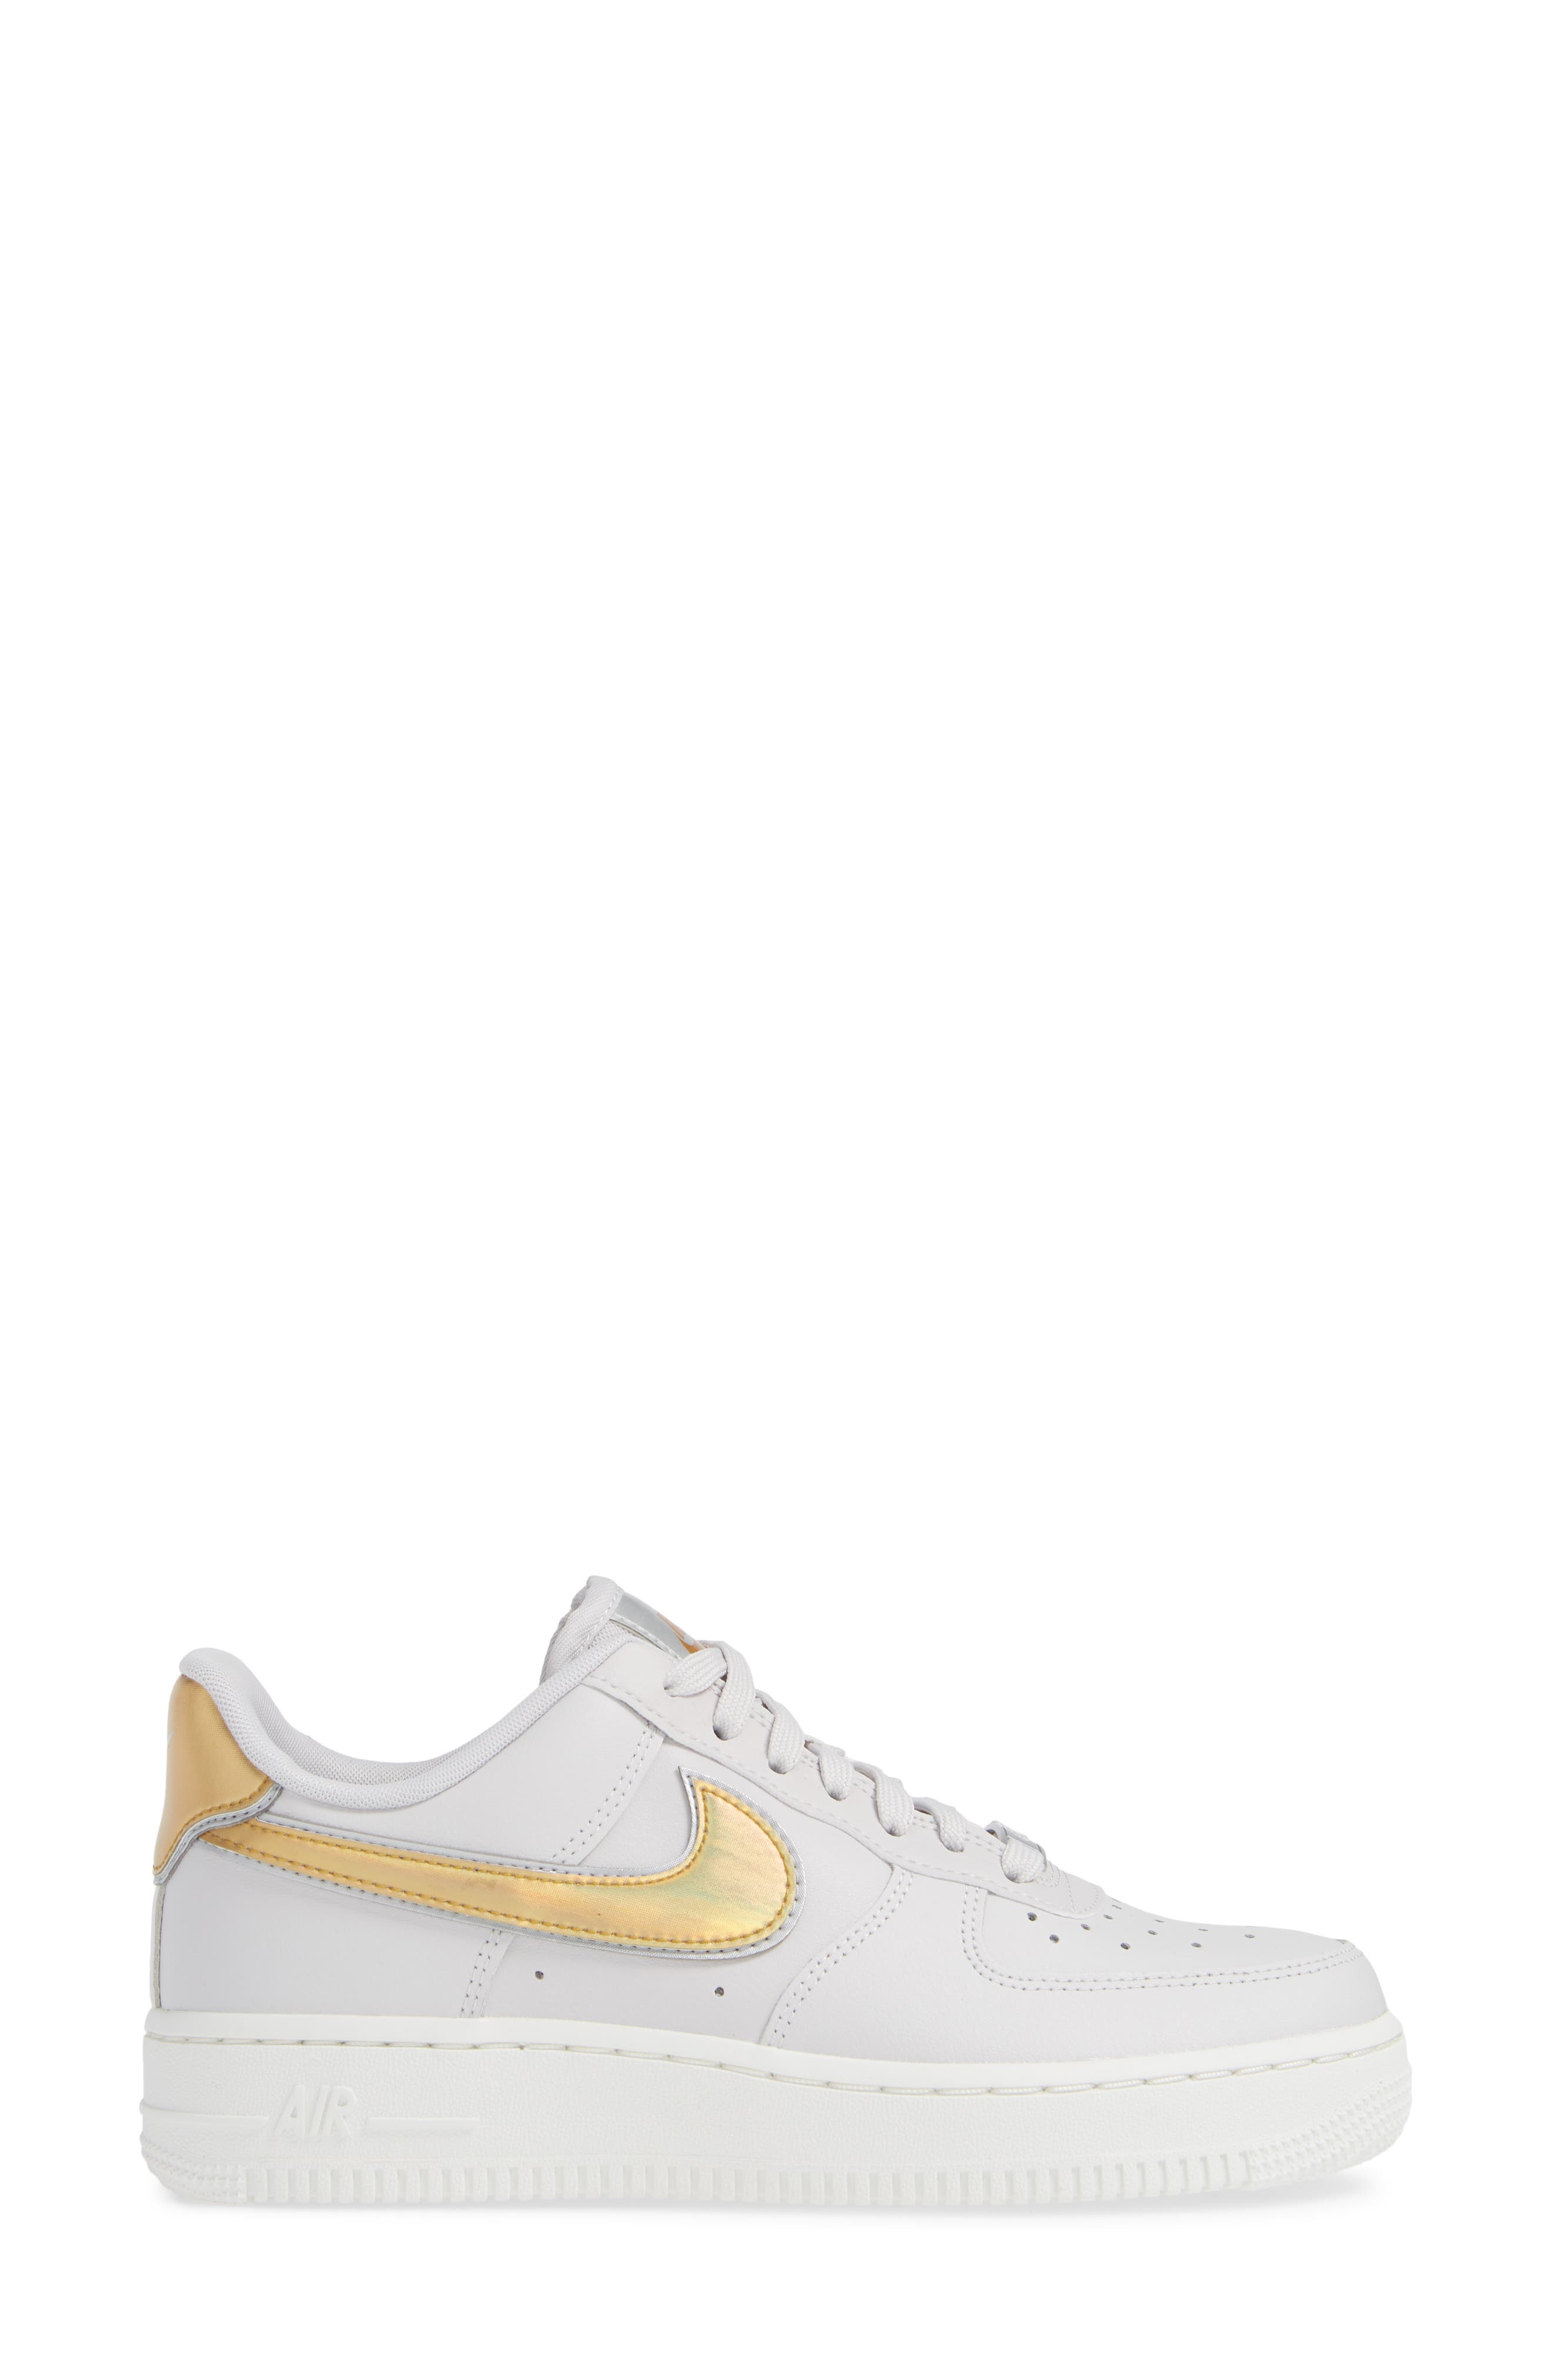 Air Force 1 '07 Premium Sneaker,                             Alternate thumbnail 3, color,                             GREY/ METALLIC GOLD- WHITE